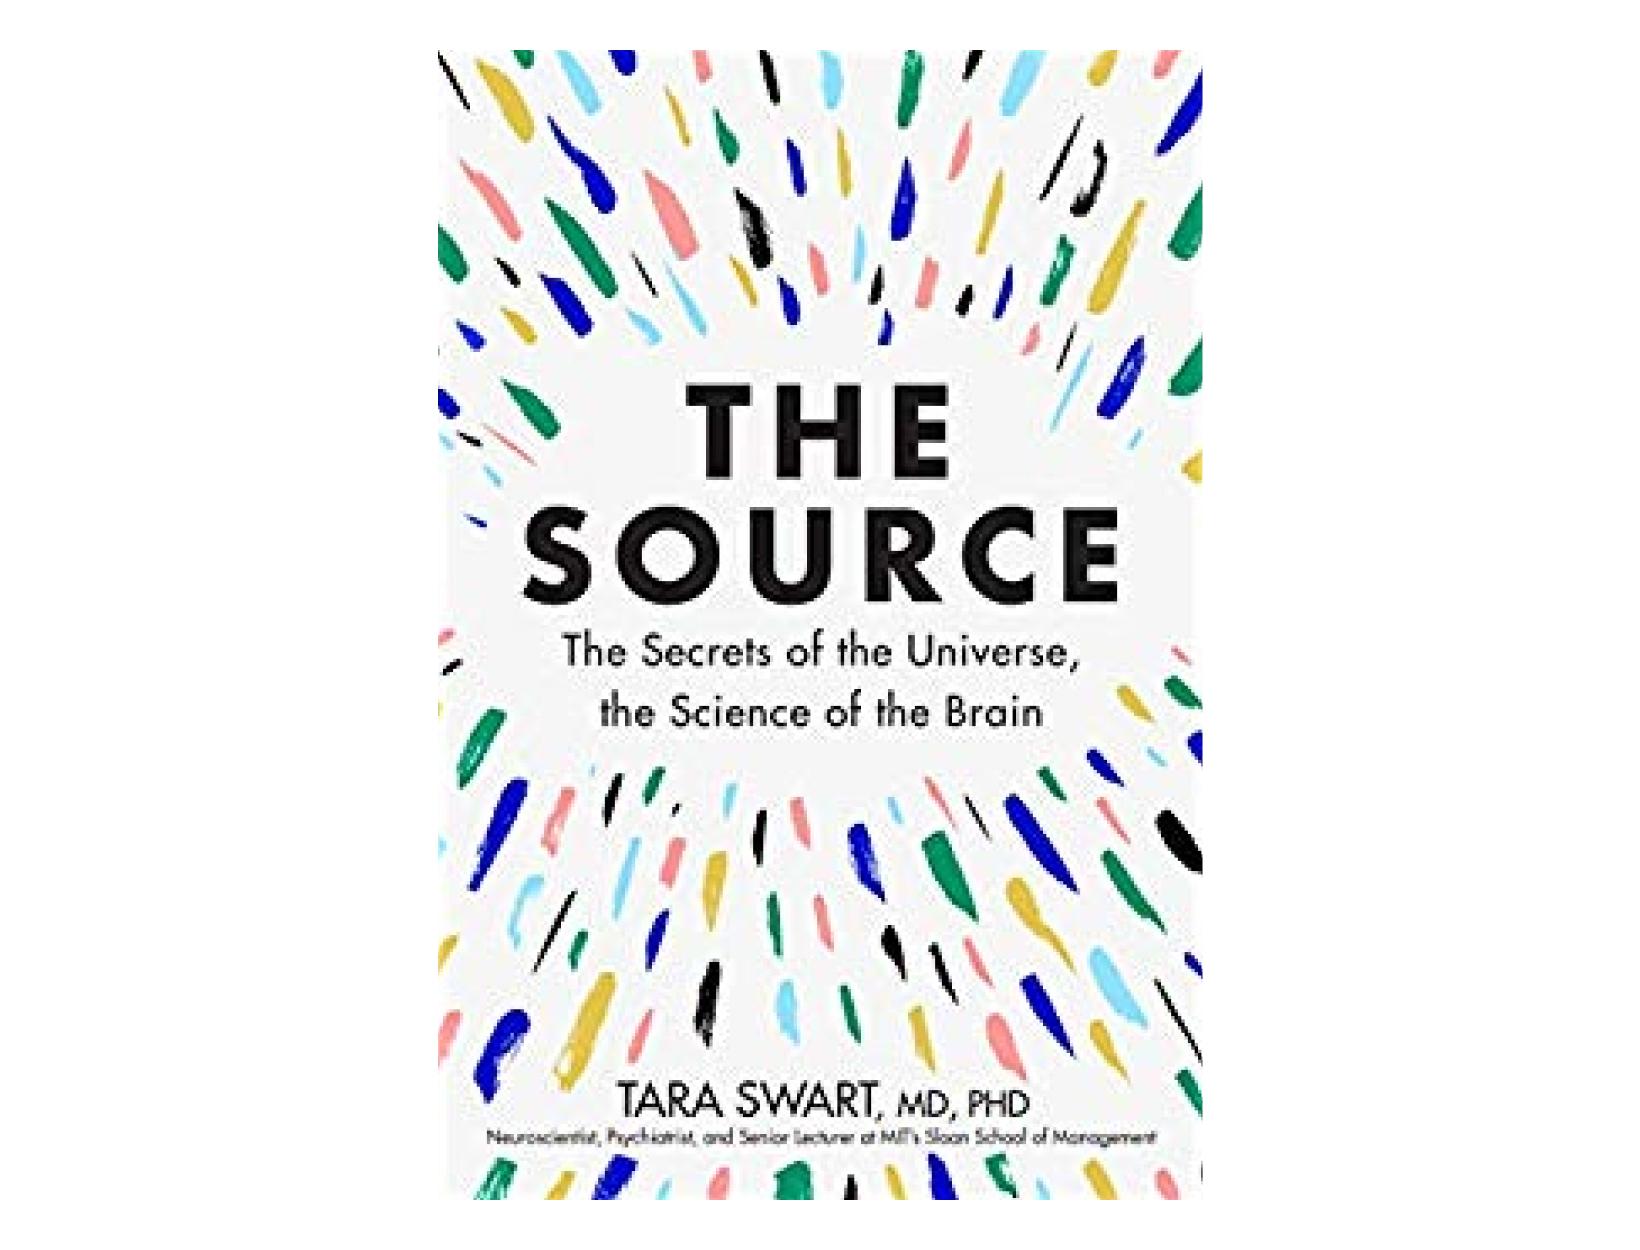 <em>The Source</em> by Tara Swart, MD, PhD